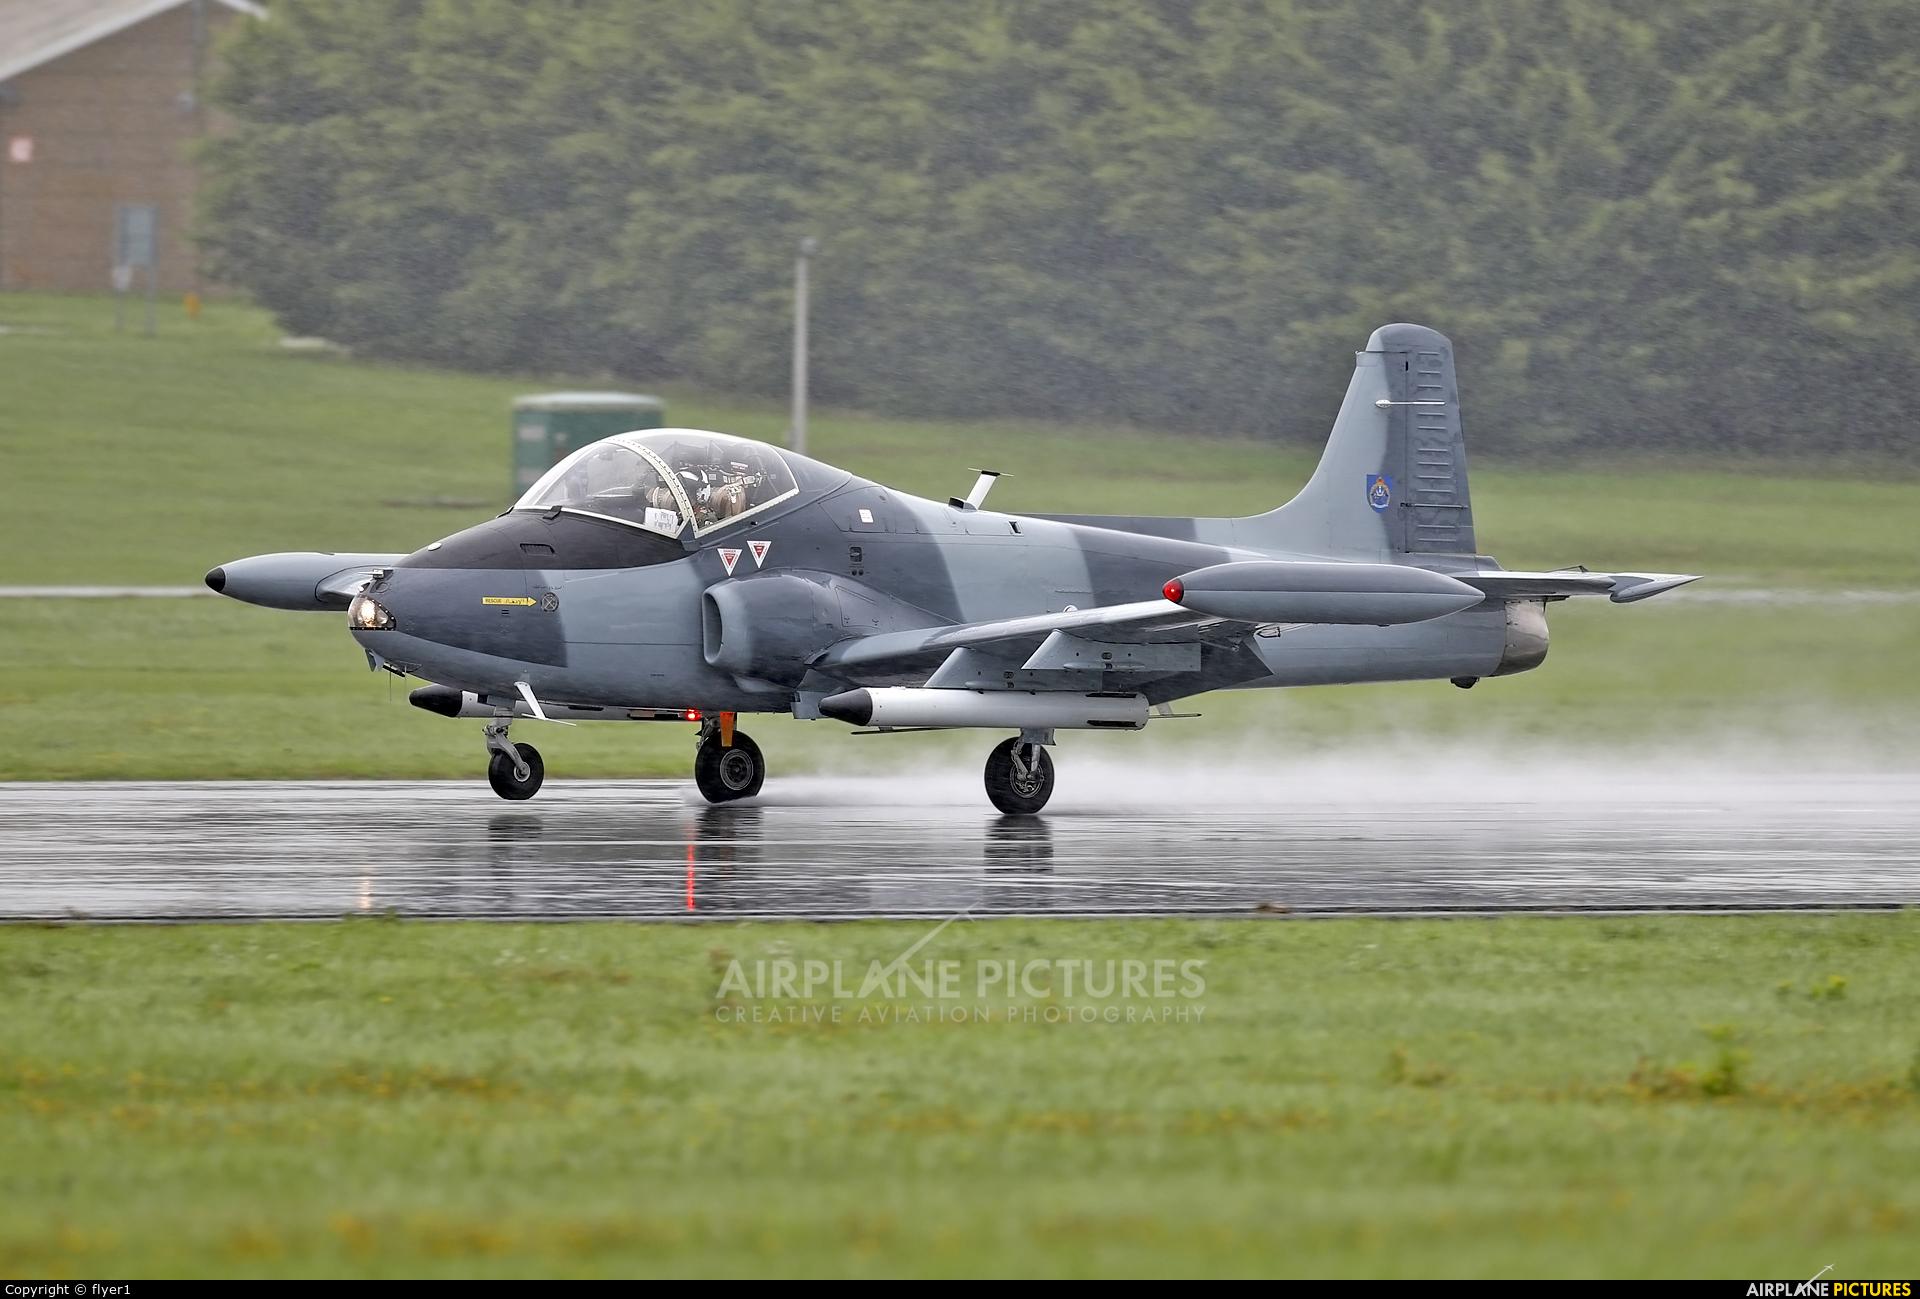 North Wales Military Aviation Services G-SOAF aircraft at Dunsfold